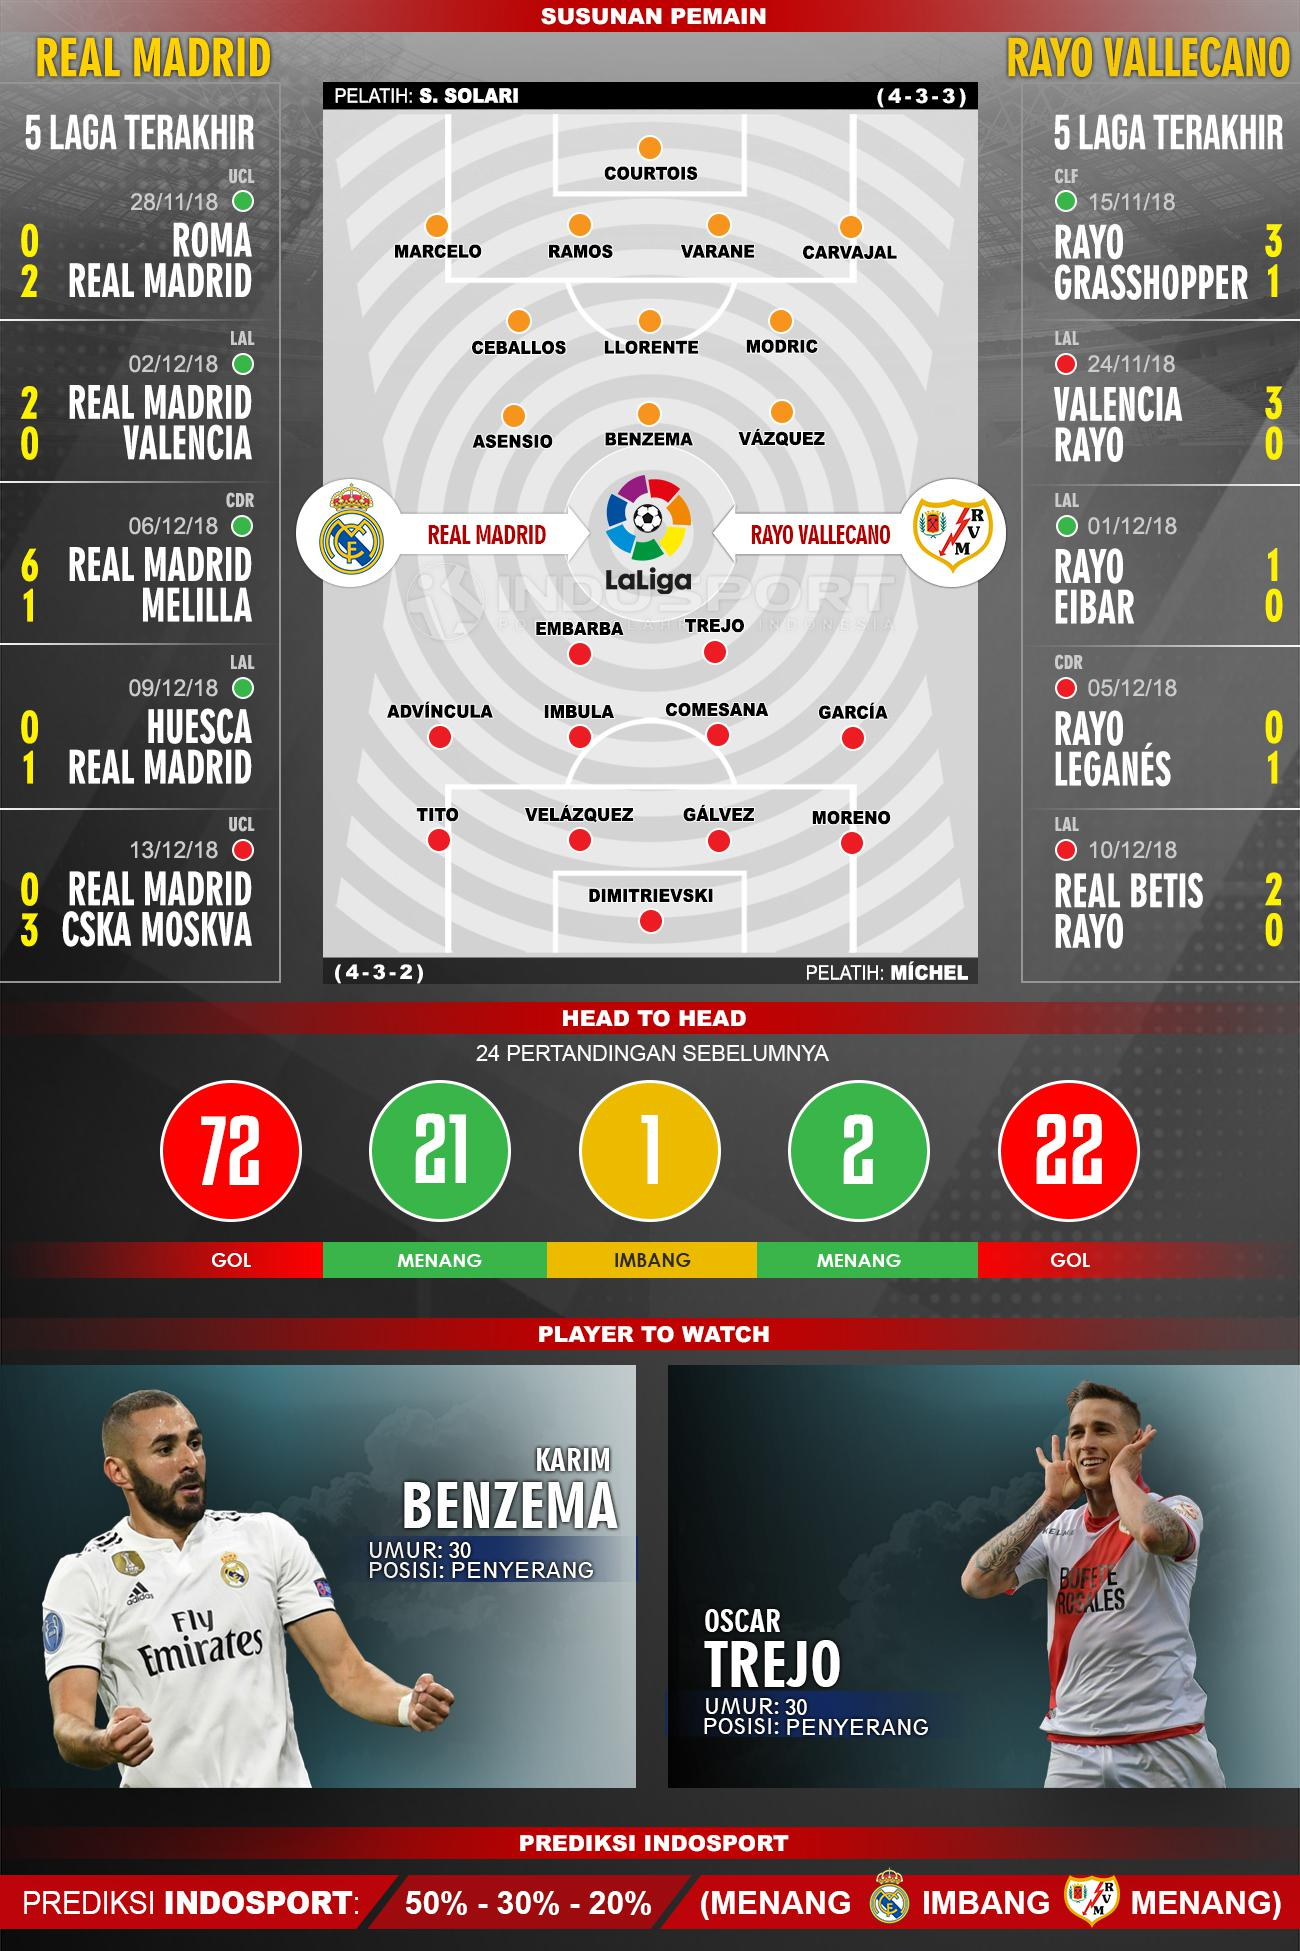 Susunan Pemain dan Lima Laga Terakhir Real Madrid Vs Rayo Vallecano Copyright: Indosport/ Muhammad Fikri Sahara